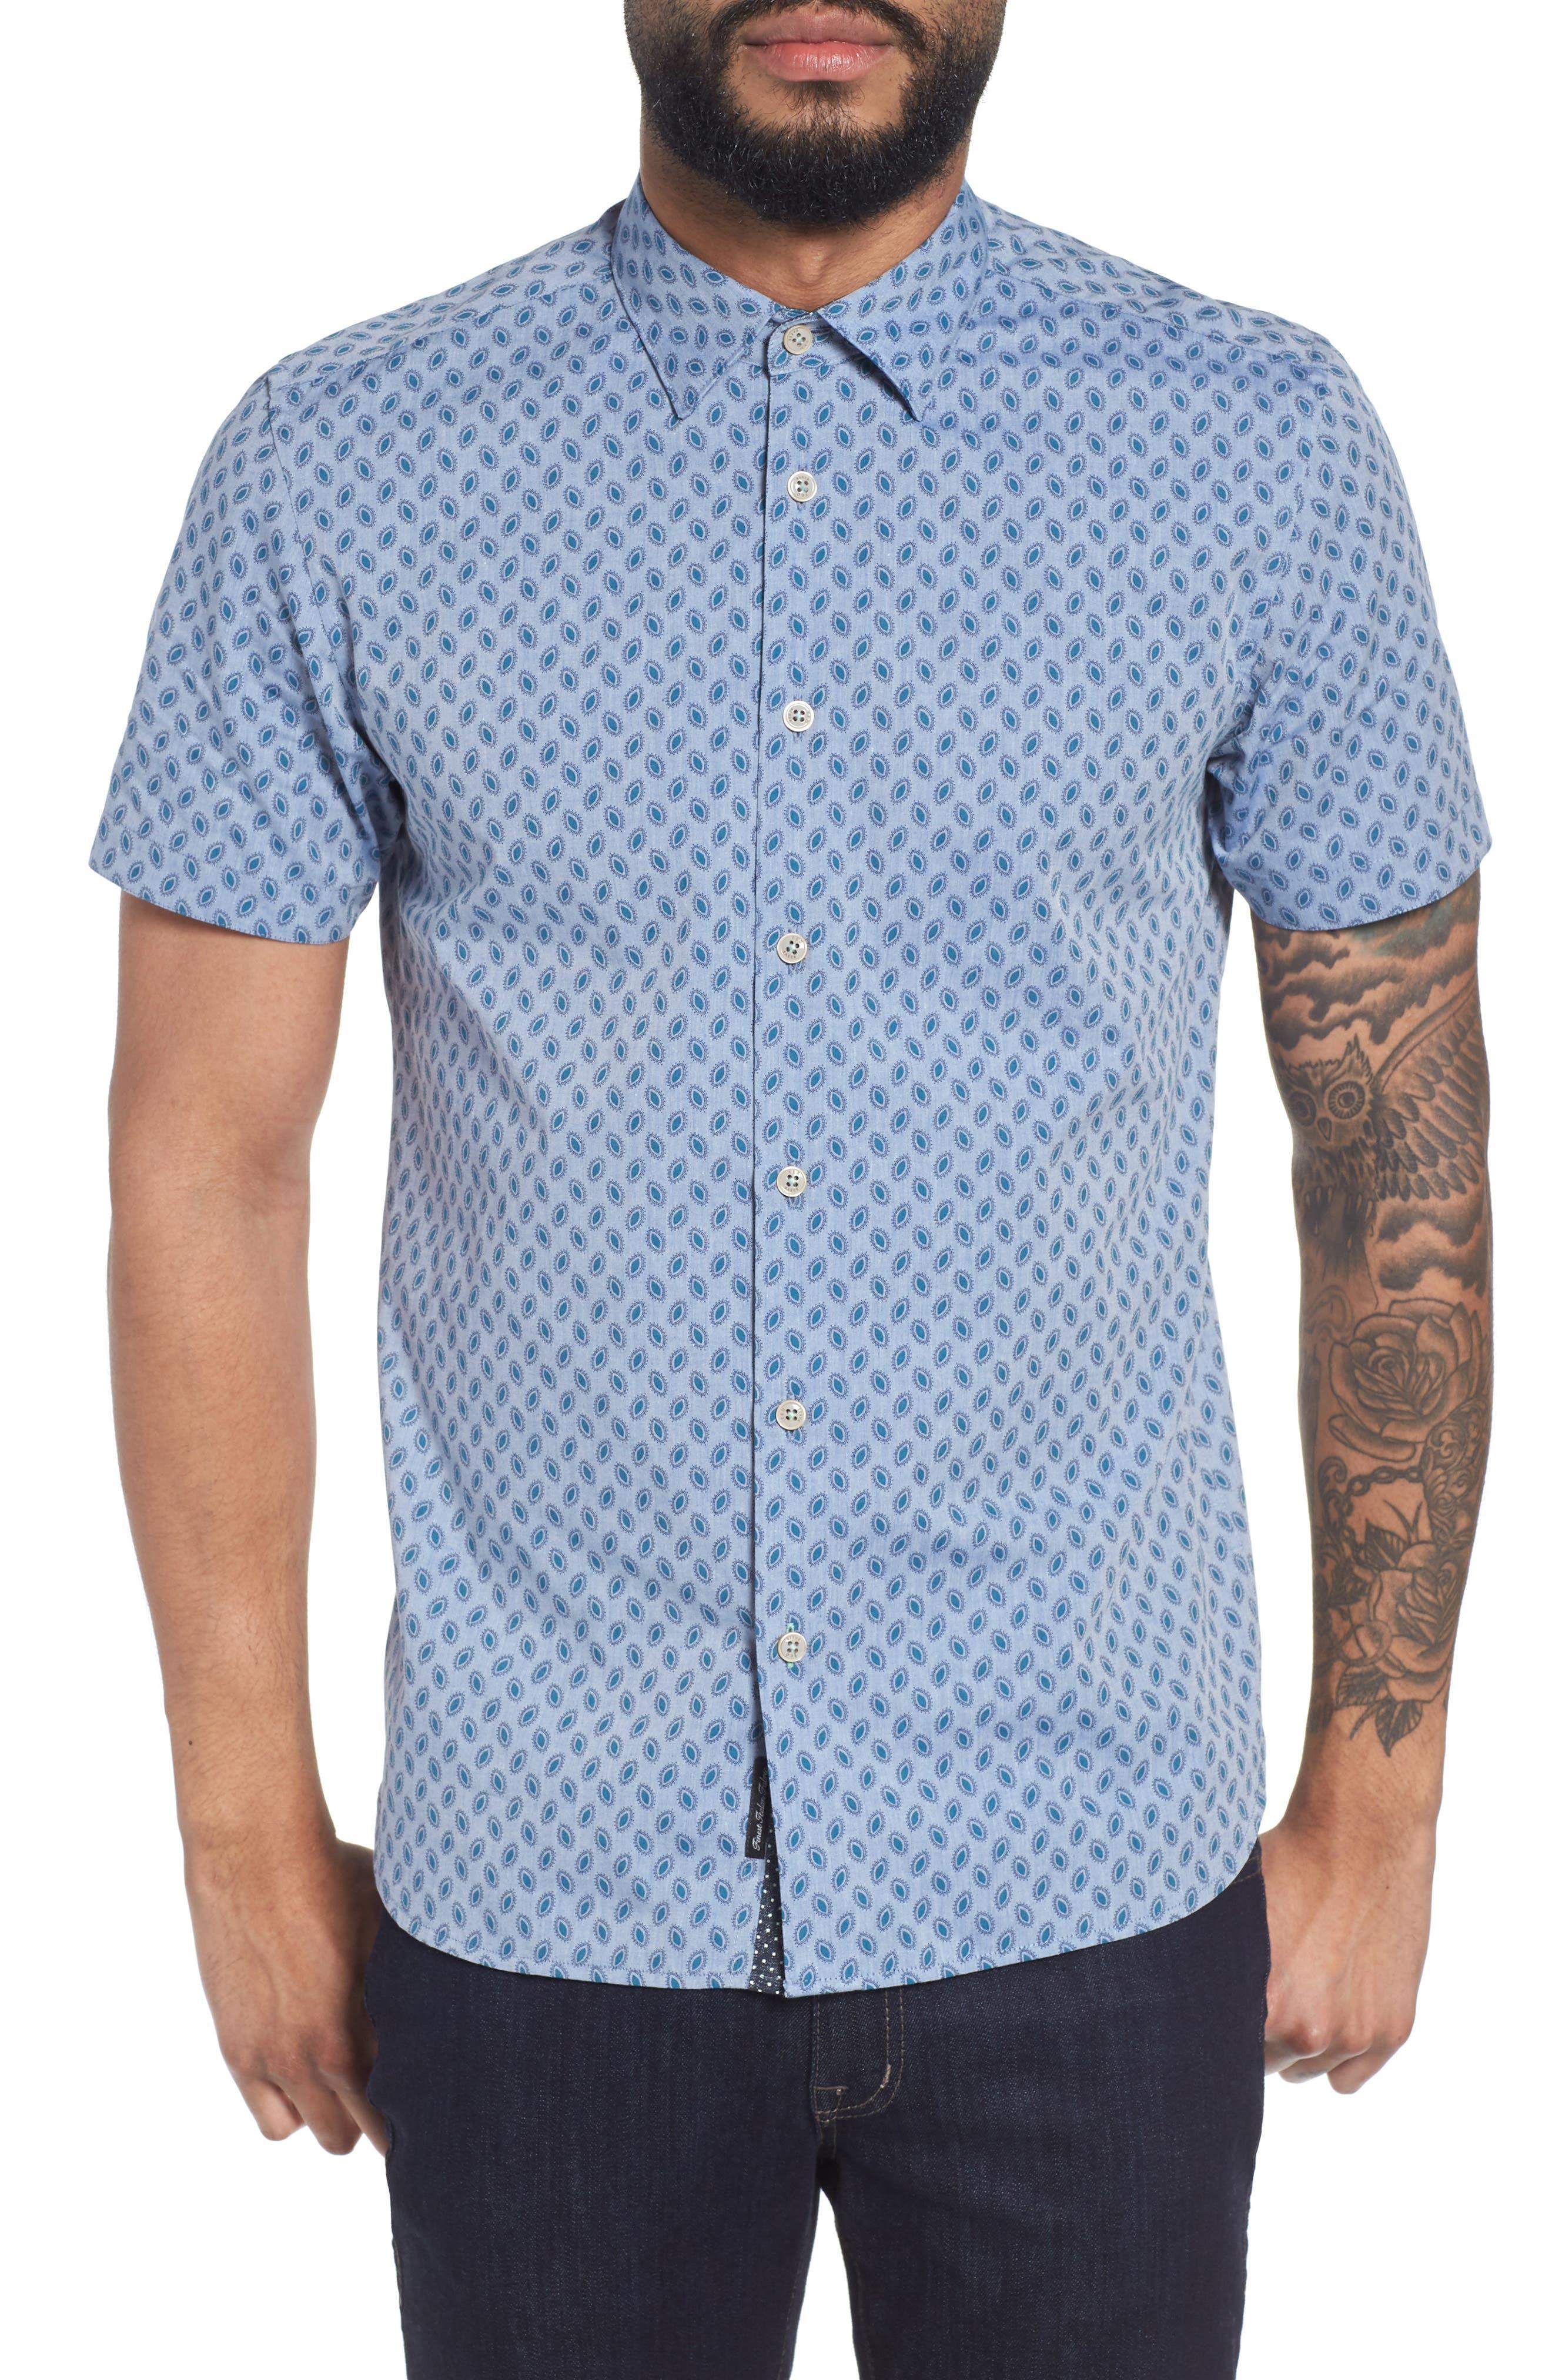 Newfott Extra Slim Fit Short Sleeve Sport Shirt,                             Main thumbnail 1, color,                             Blue